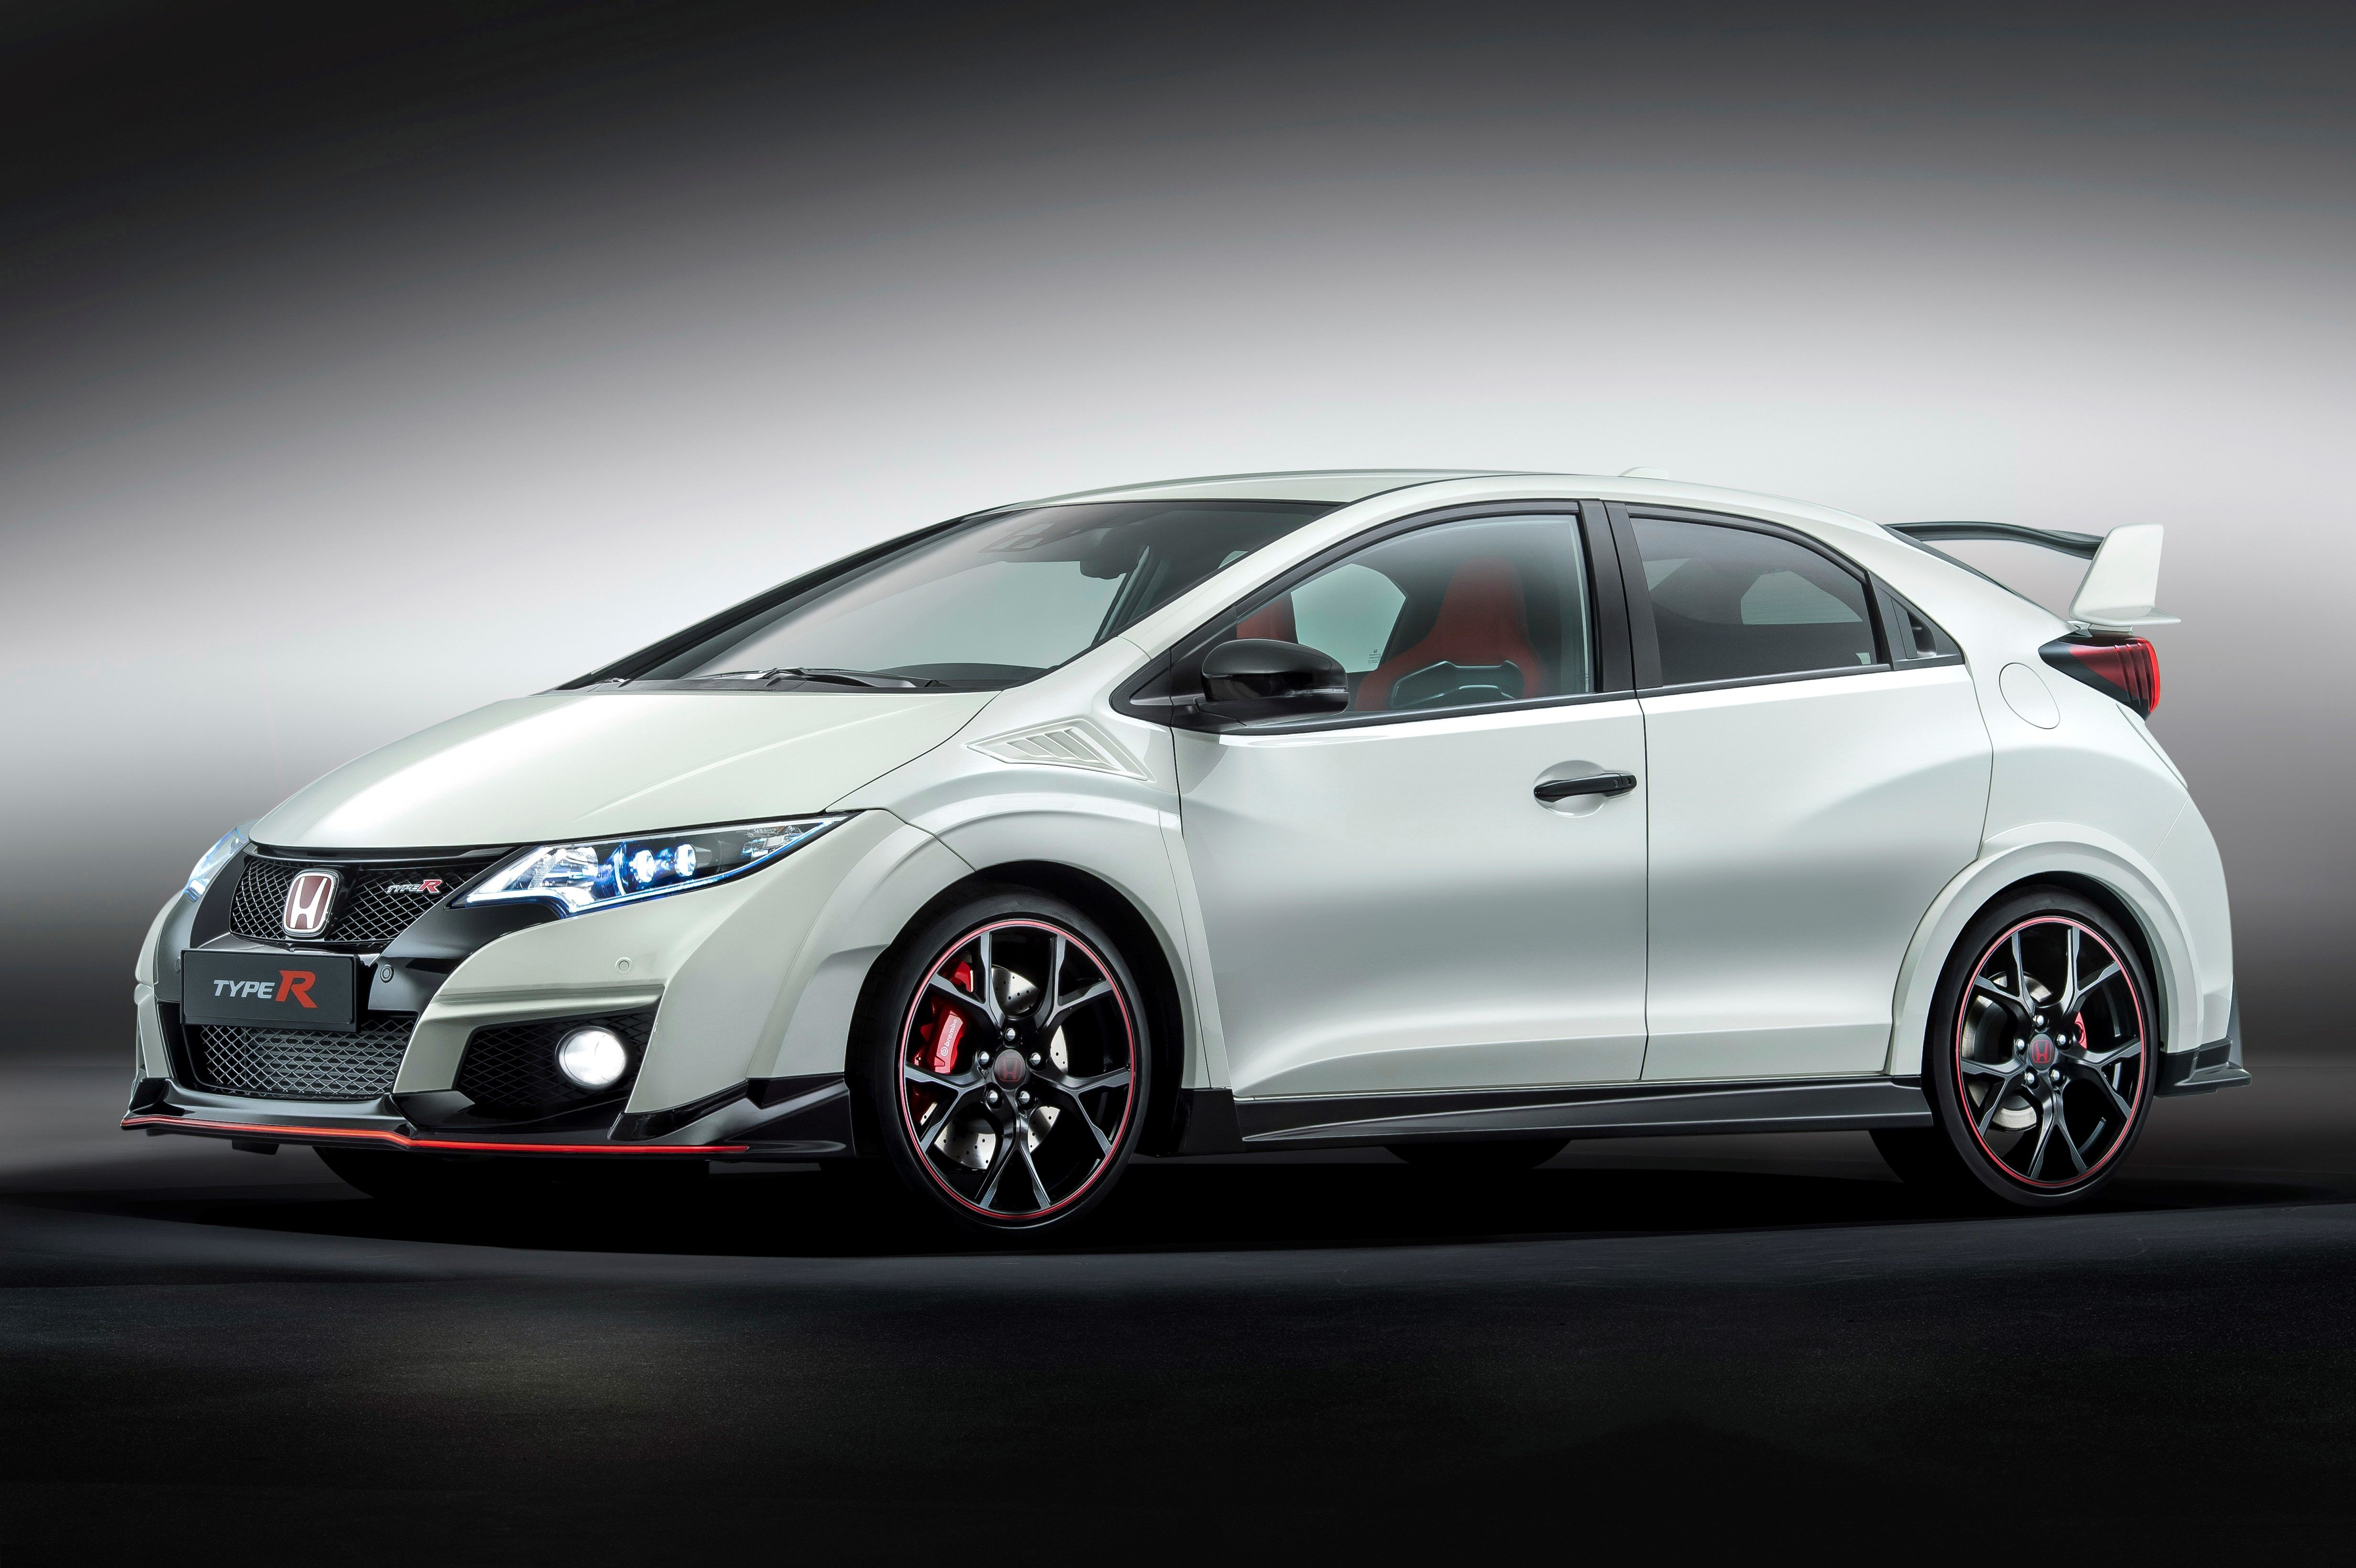 2015 Honda Civic Type R (European model) ホンダ シビック, シビック